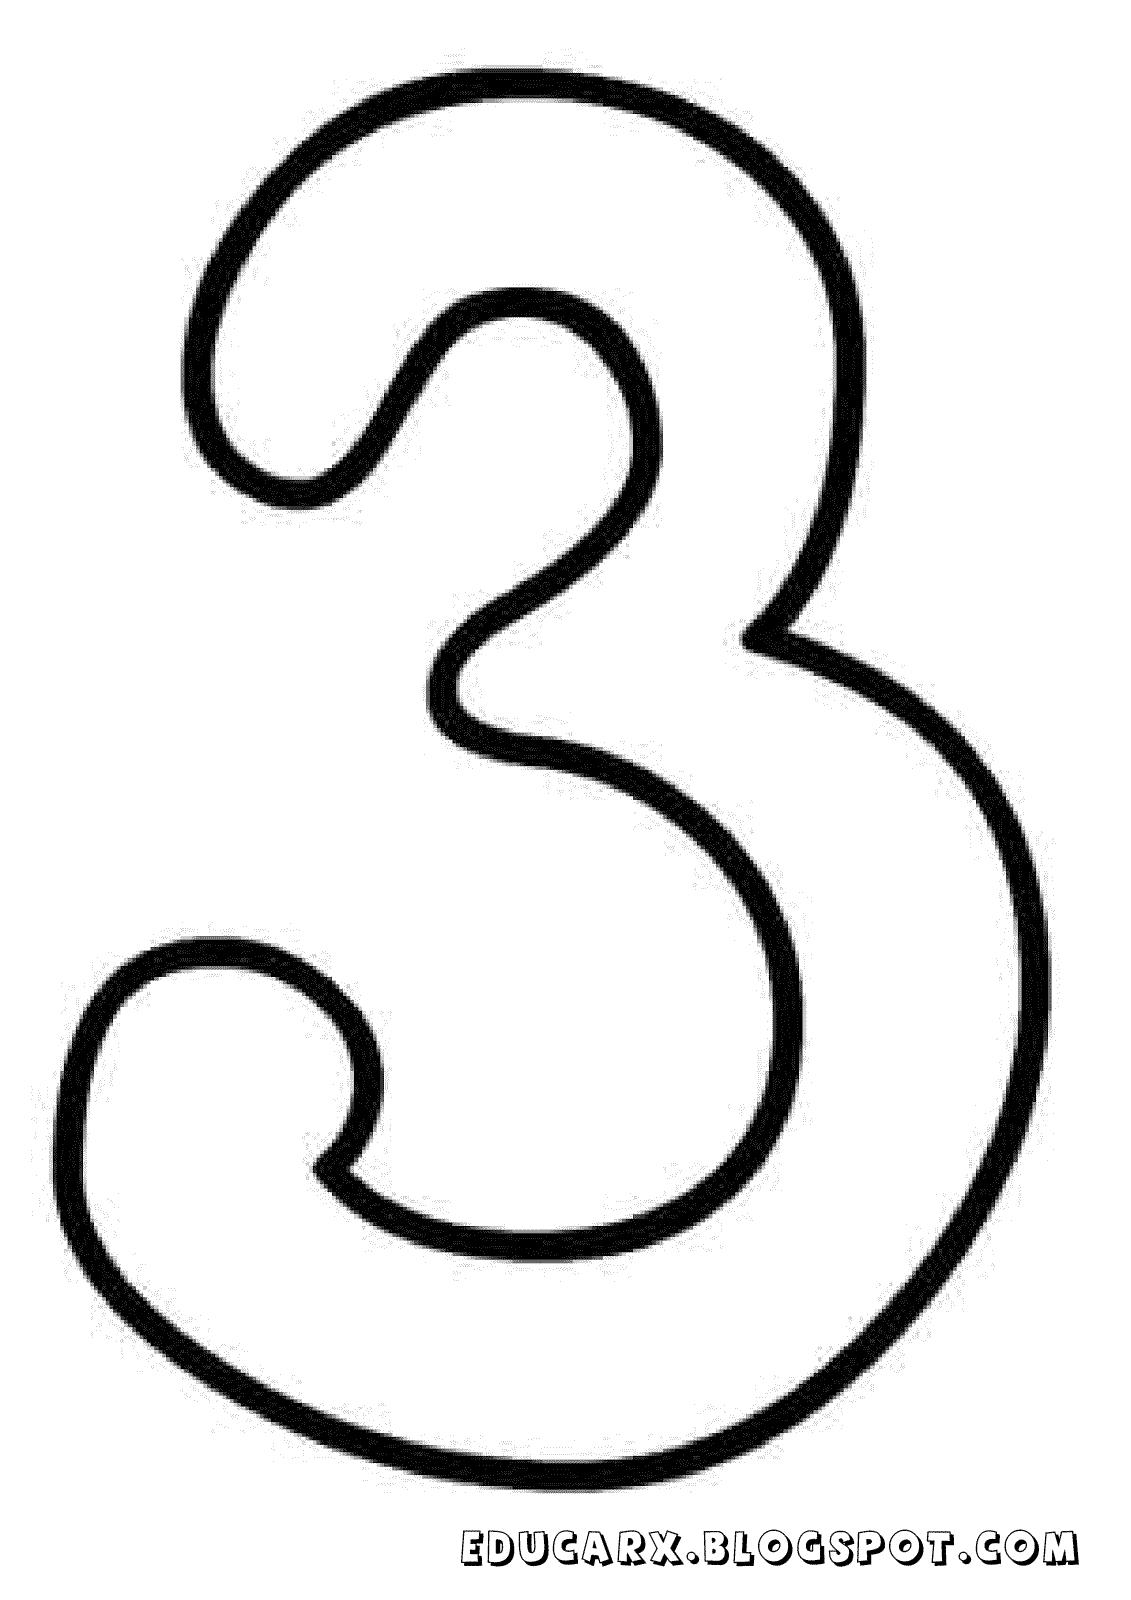 Molde do numero 3